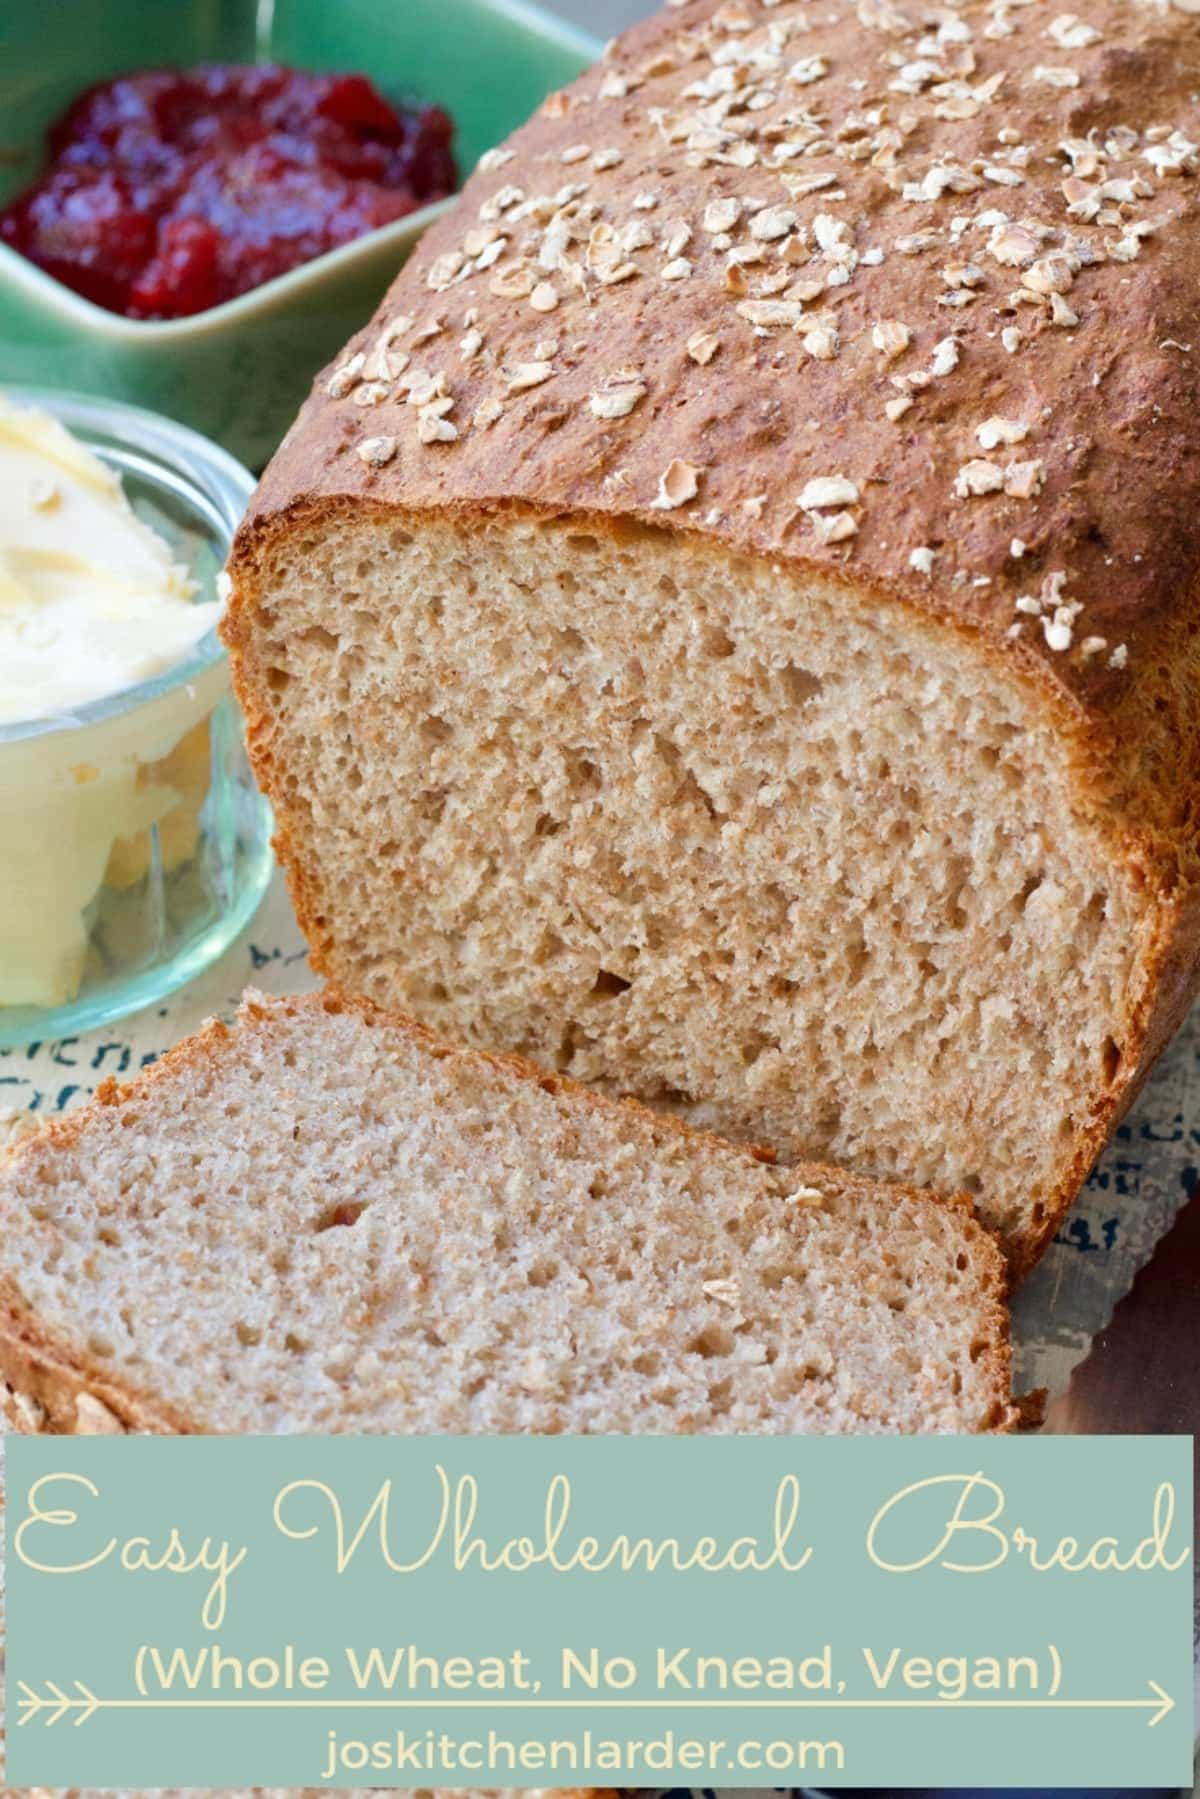 Easy Wholemeal Bread Recipe (No Knead)